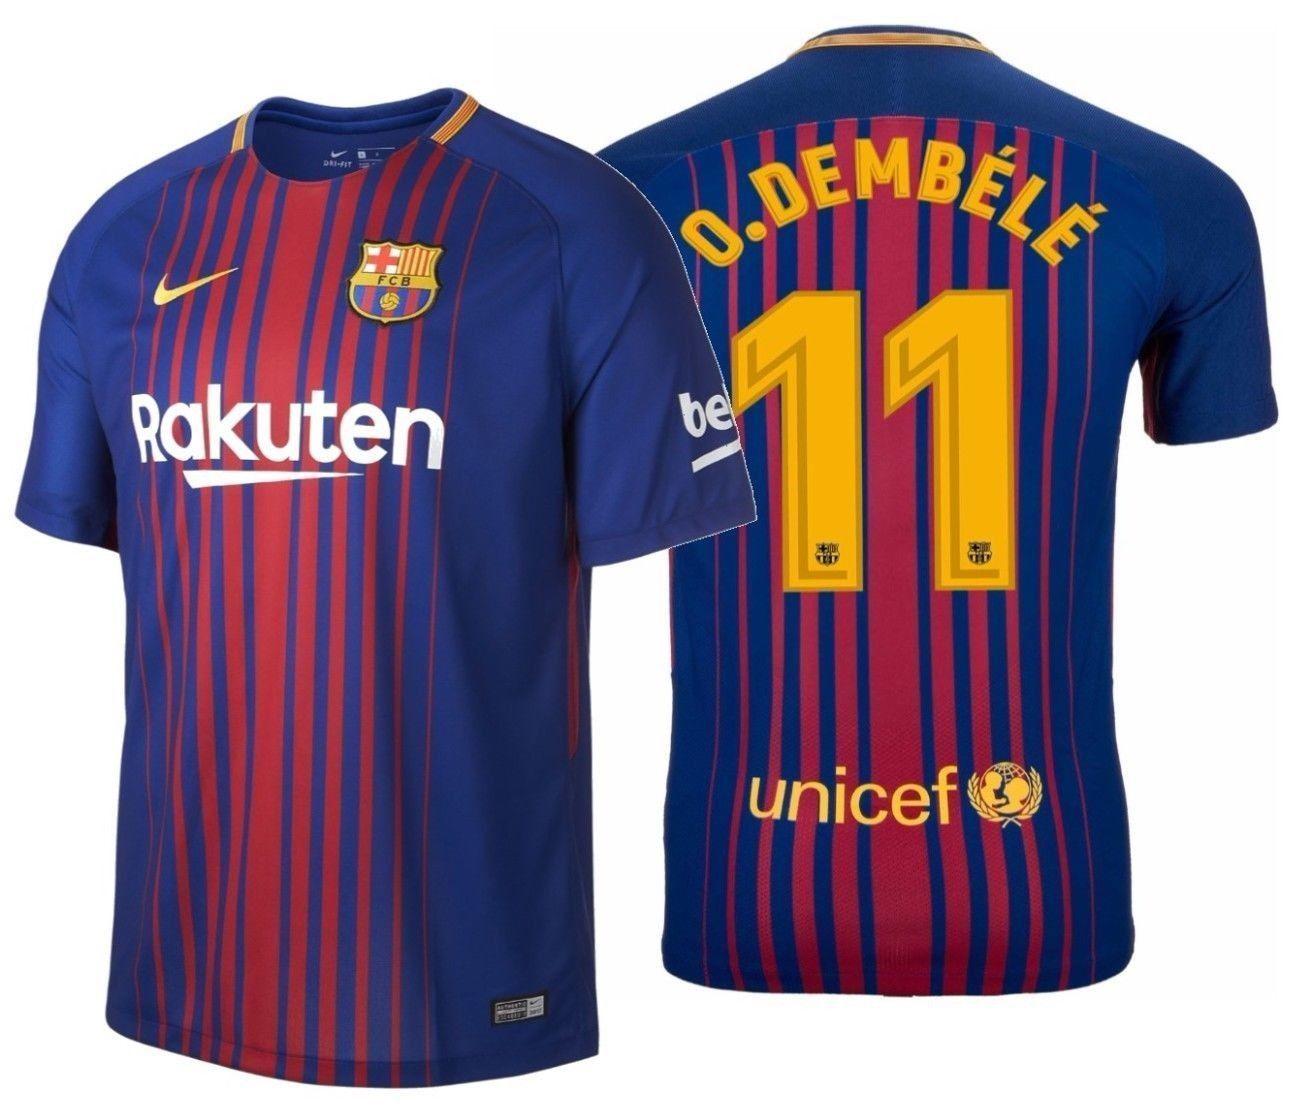 buy online 71b31 09e0e Nike ousmane dembele fc barcelona home jersey 2017/18 in ...